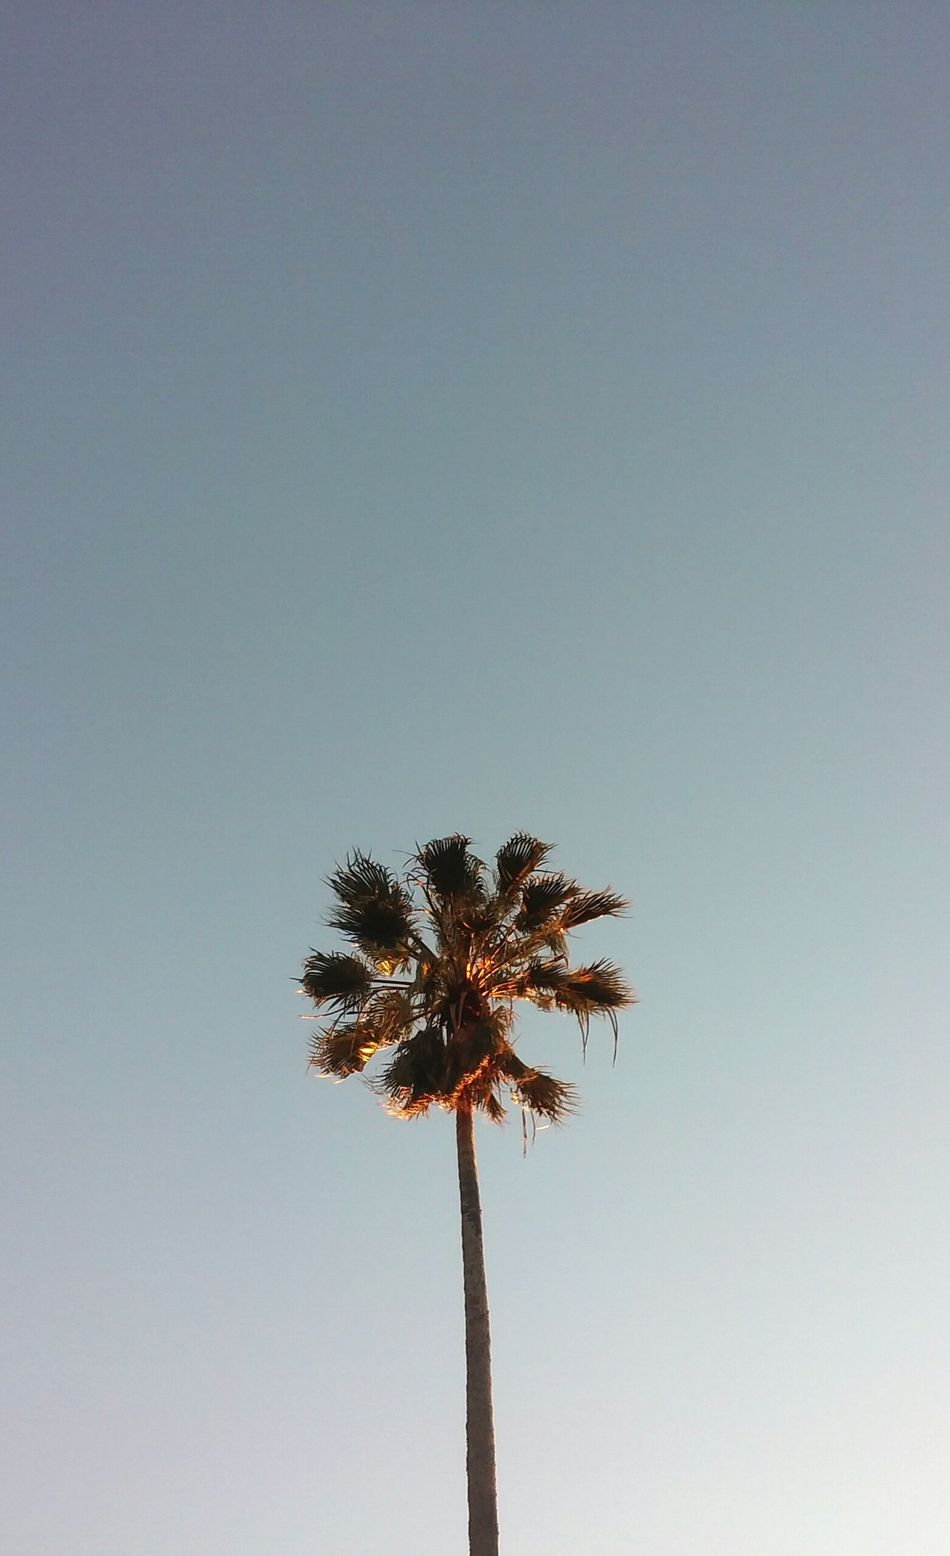 Fotografia VSCO Palm Tree Sky Tree Tranquility Vscogrid Vscogram Fotography VSCO Photographer Photography Photooftheday Vscofotografia_ Foto Photo Brasil Vscoeyeem Photoshoot Bagé Like Day Nature Clear Sky